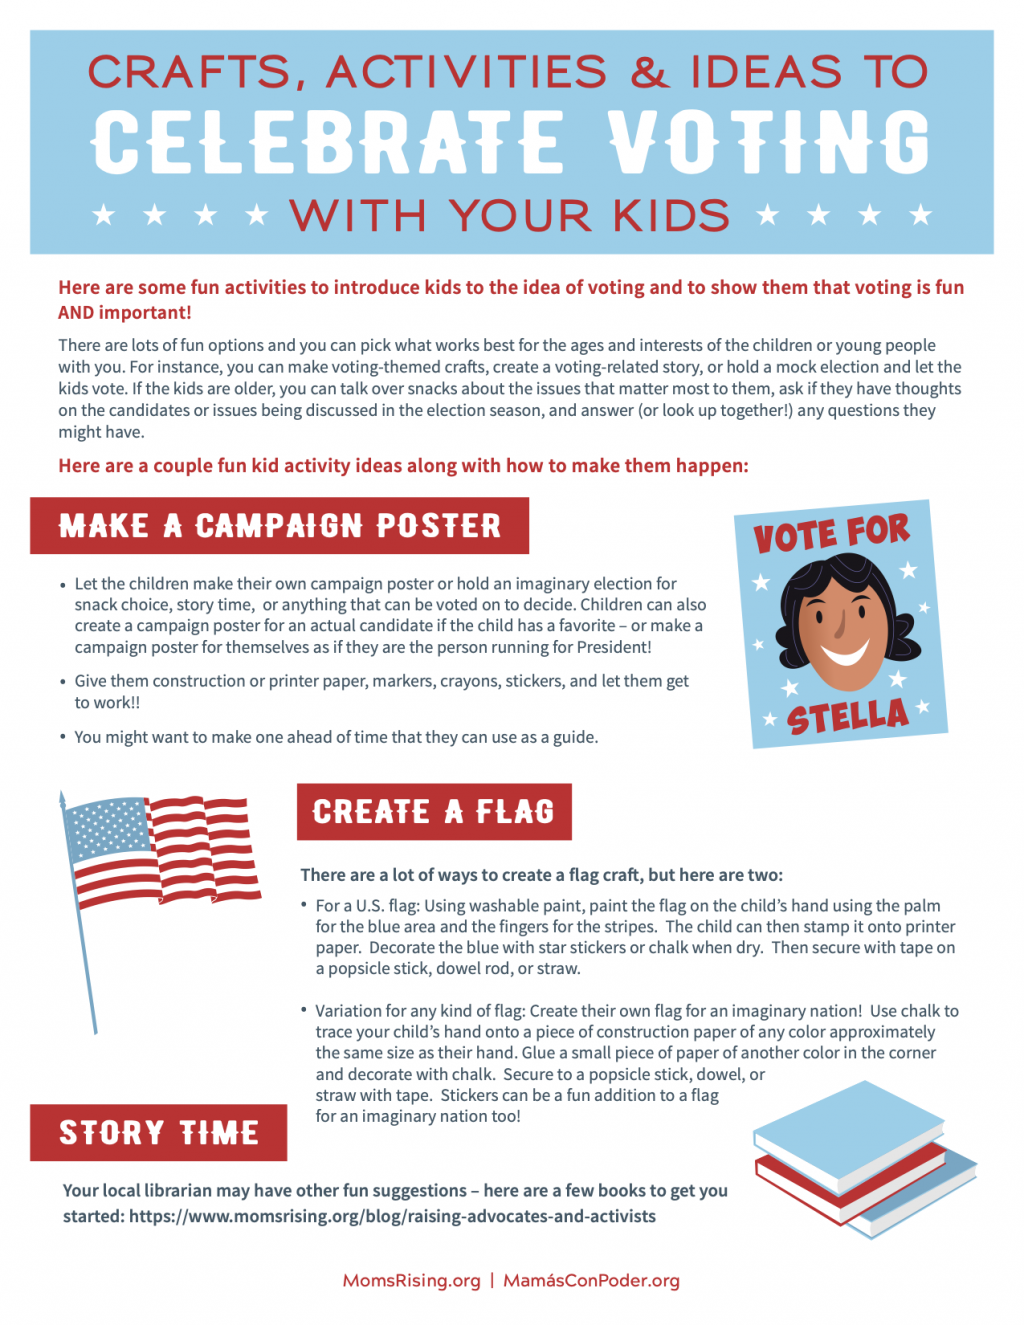 [IMAGE DESCRIPTION: A coloring page with a voting superhero]